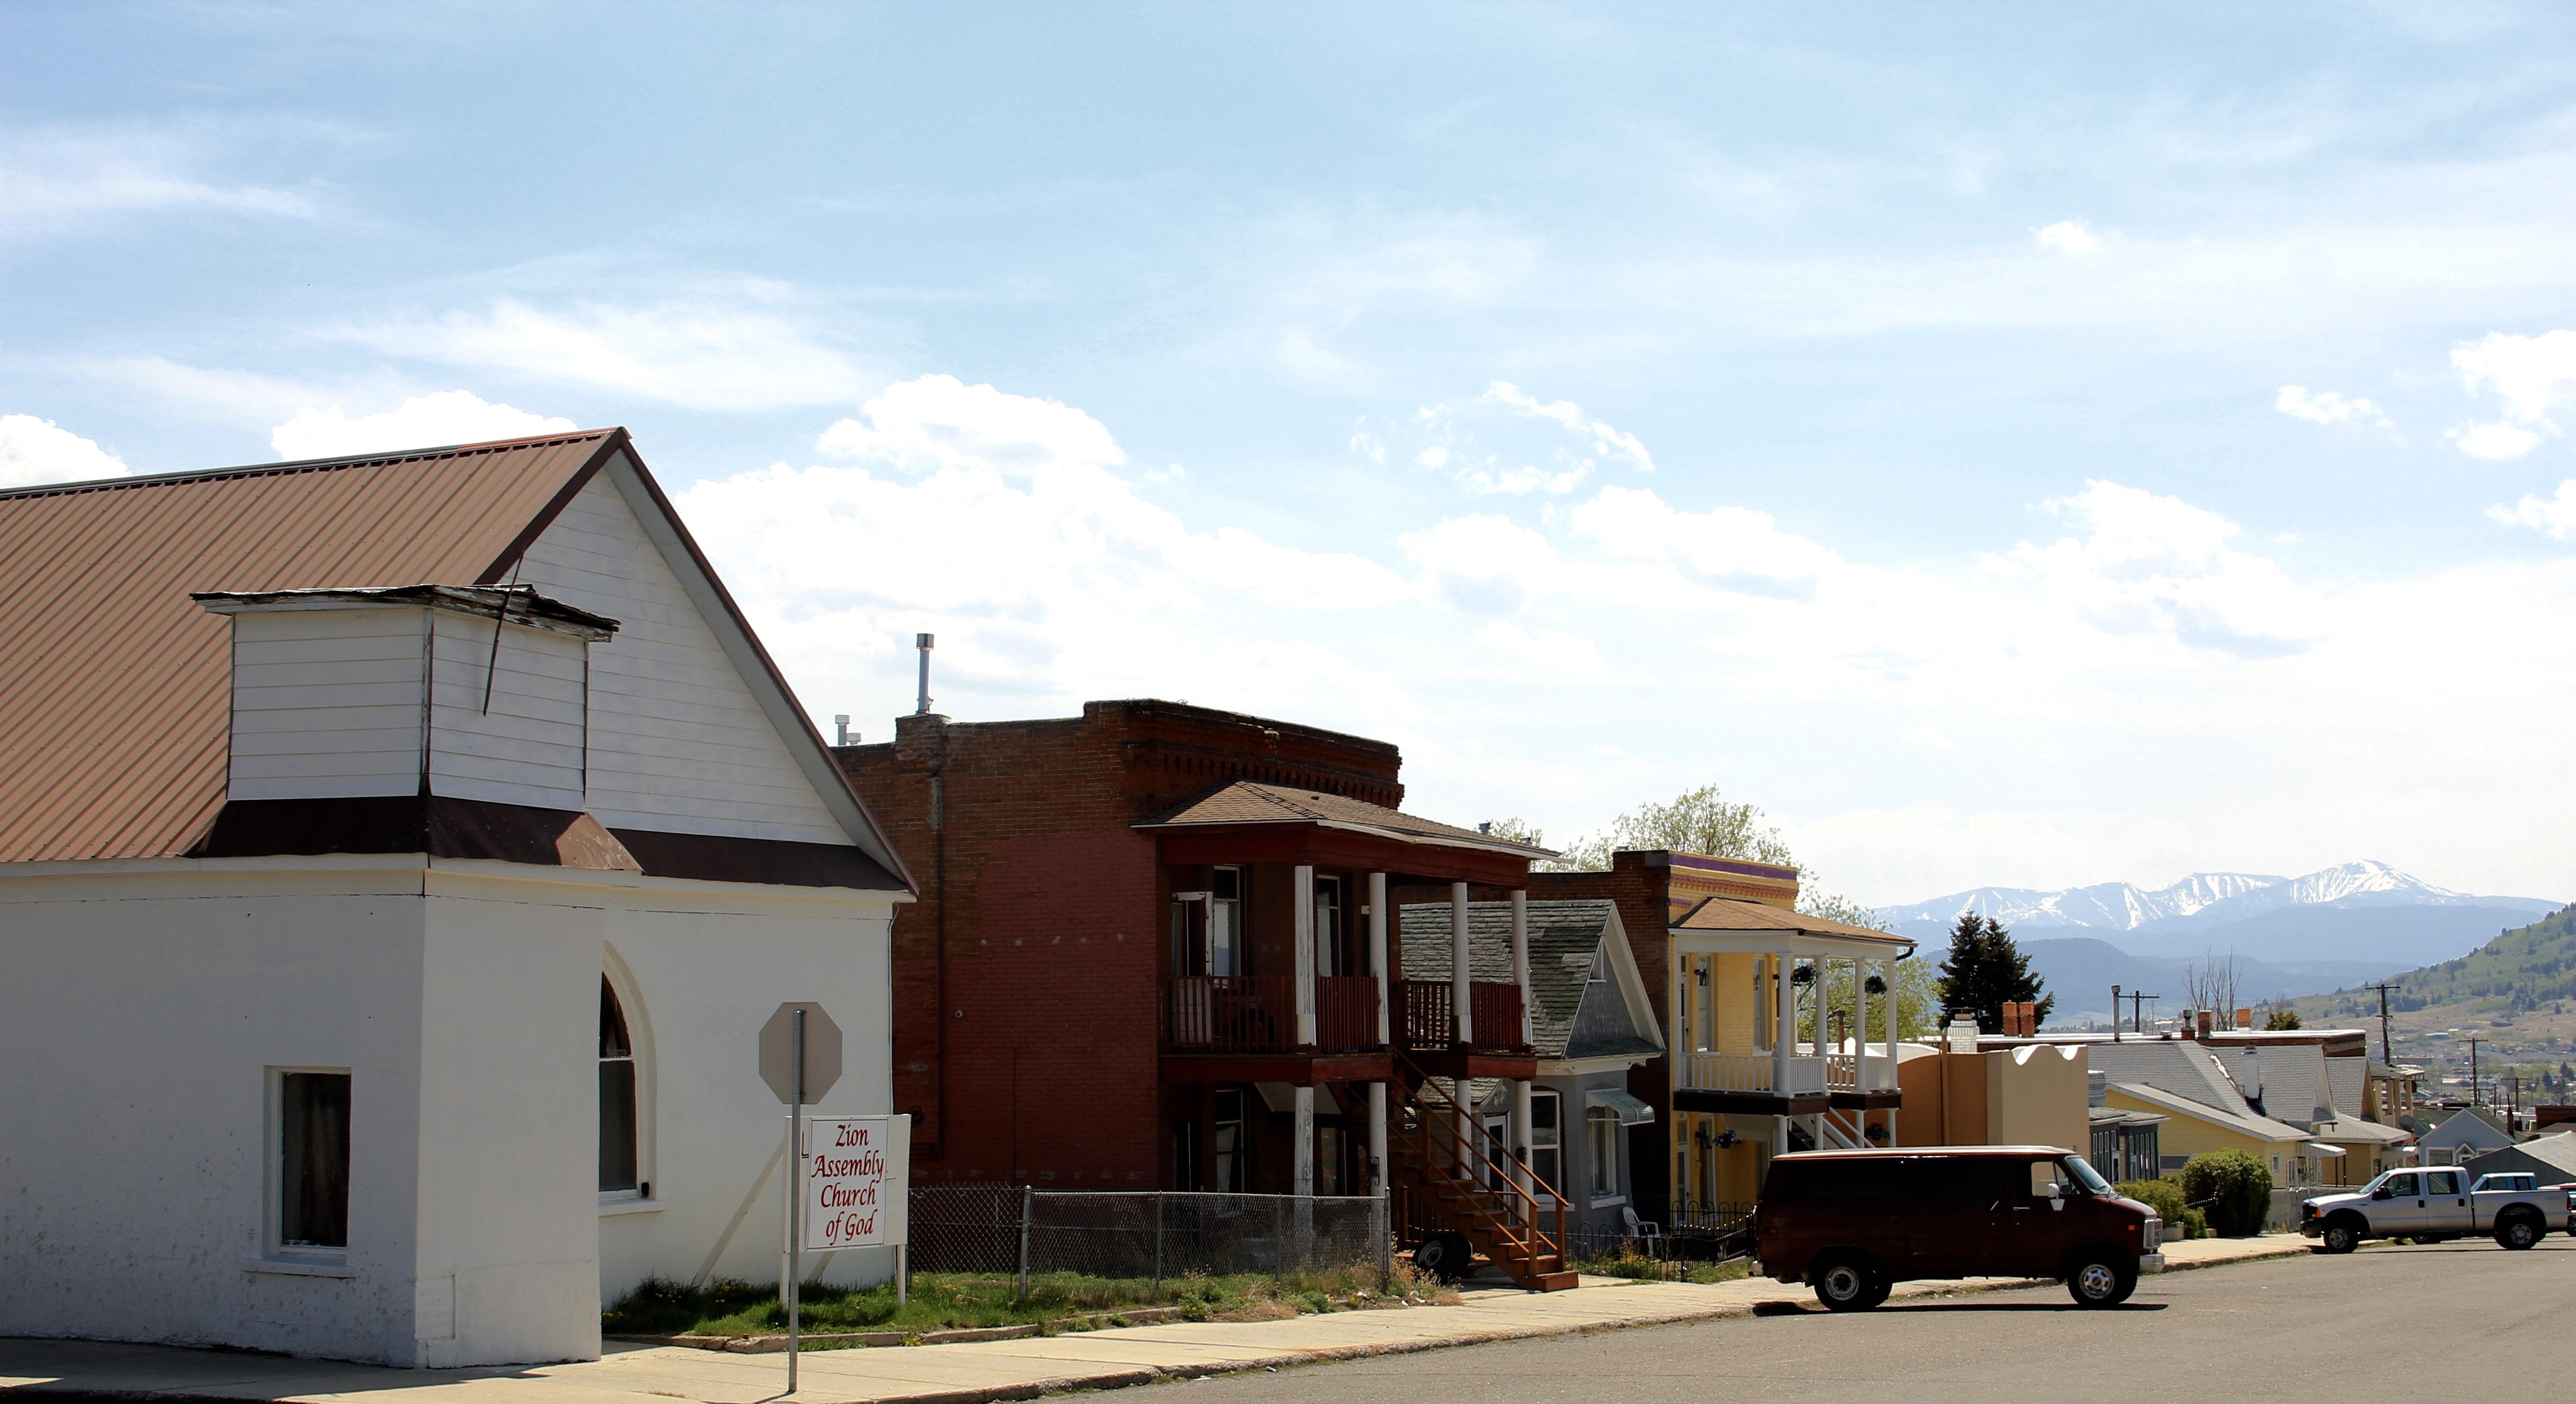 Idaho St at Shaffers AME